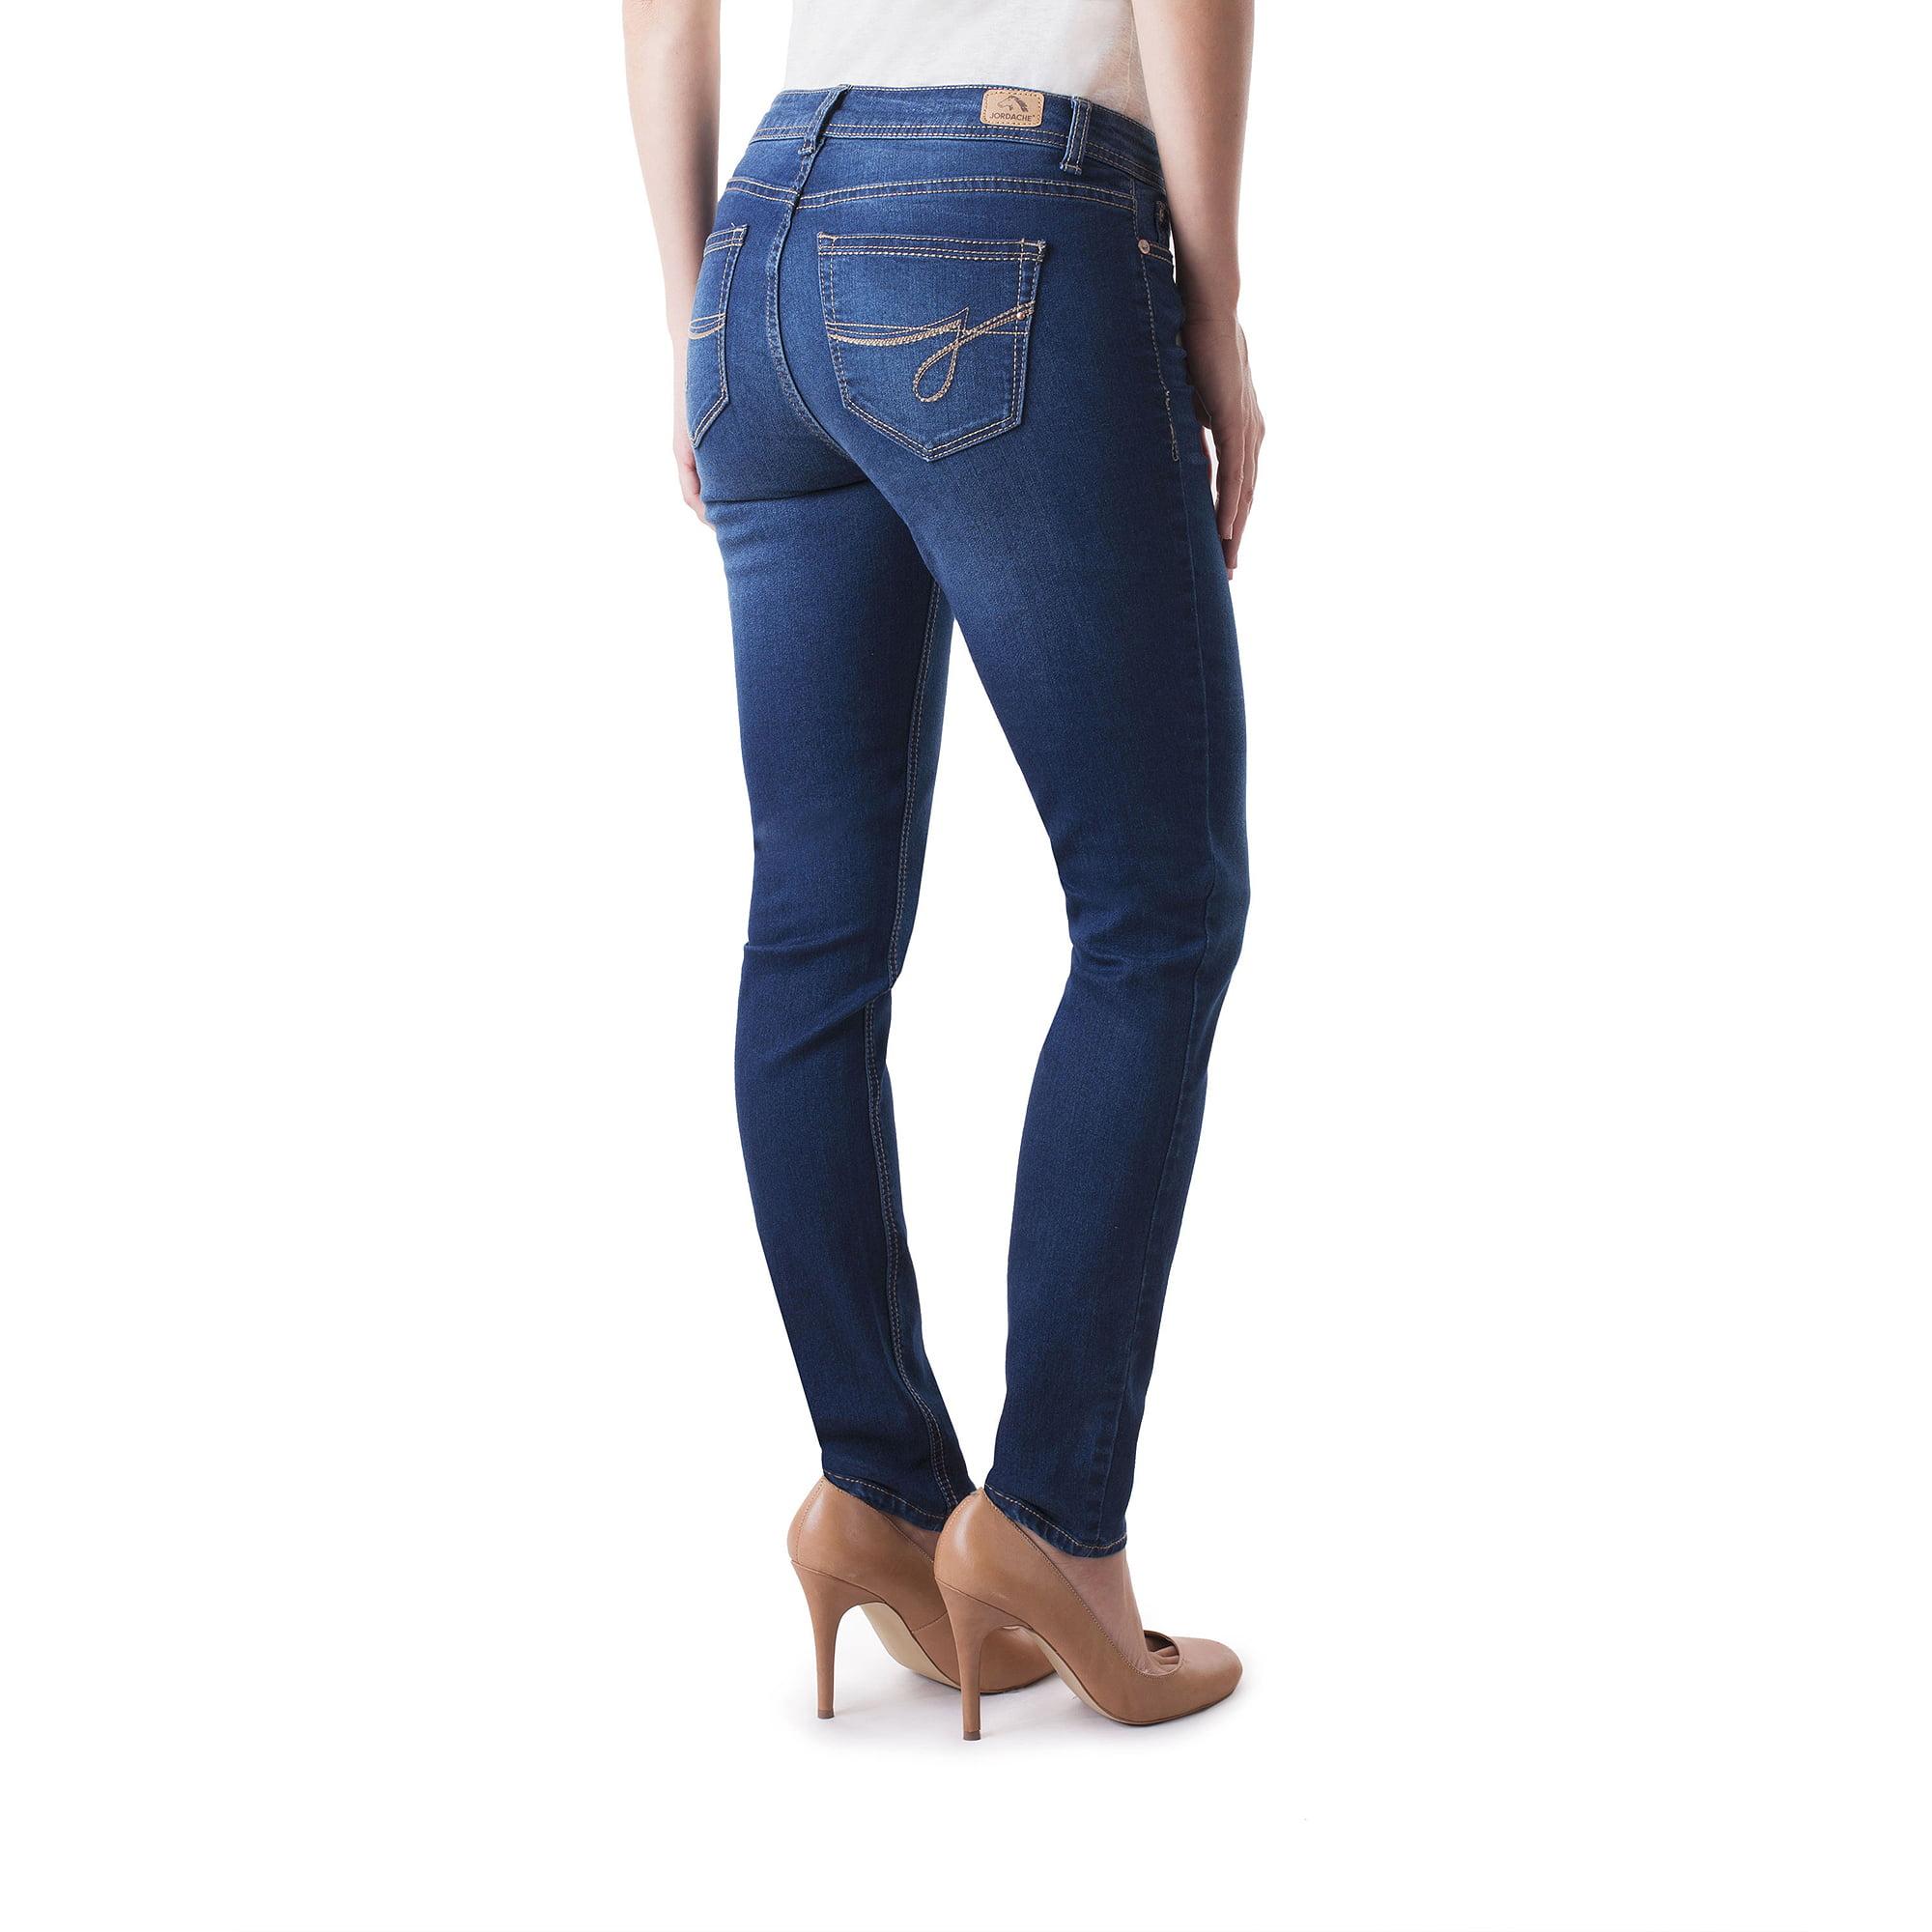 618fa7e463b Jordache - Women s Skinny Jeans Available in Regular and Petite -  Walmart.com